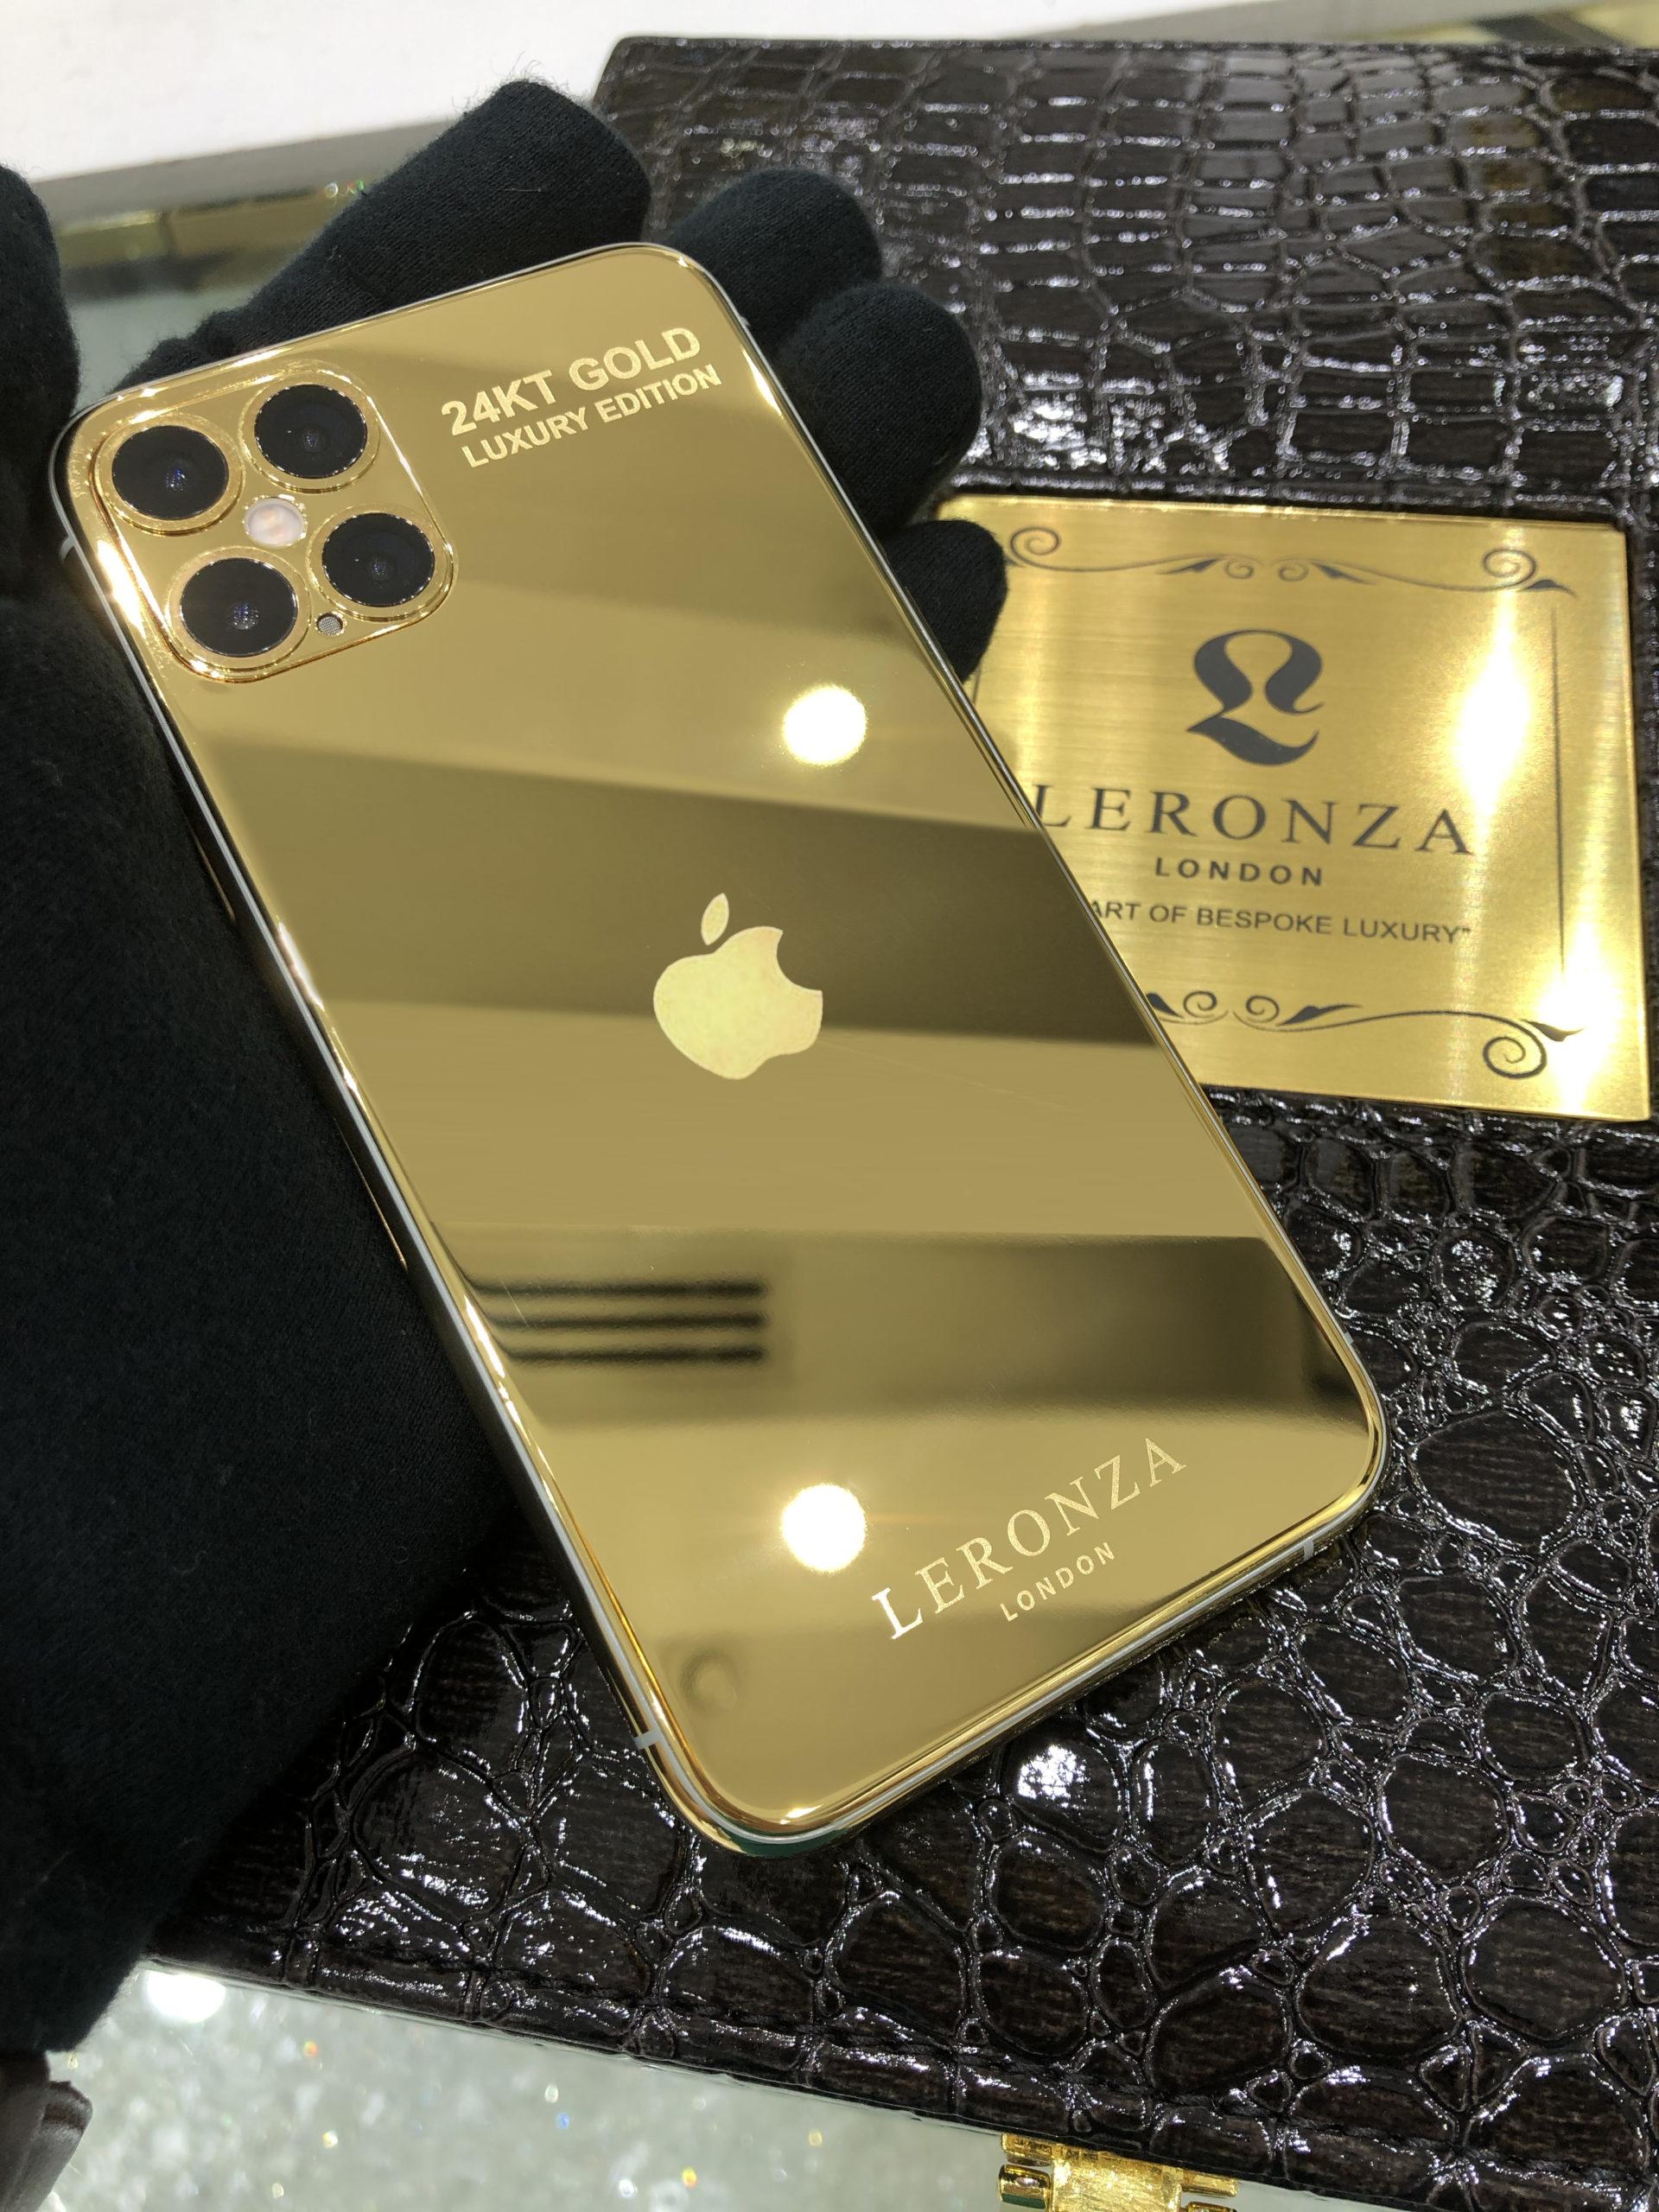 New Luxury 24k Gold iPhone 12 Pro and 12 Pro Max - Leronza